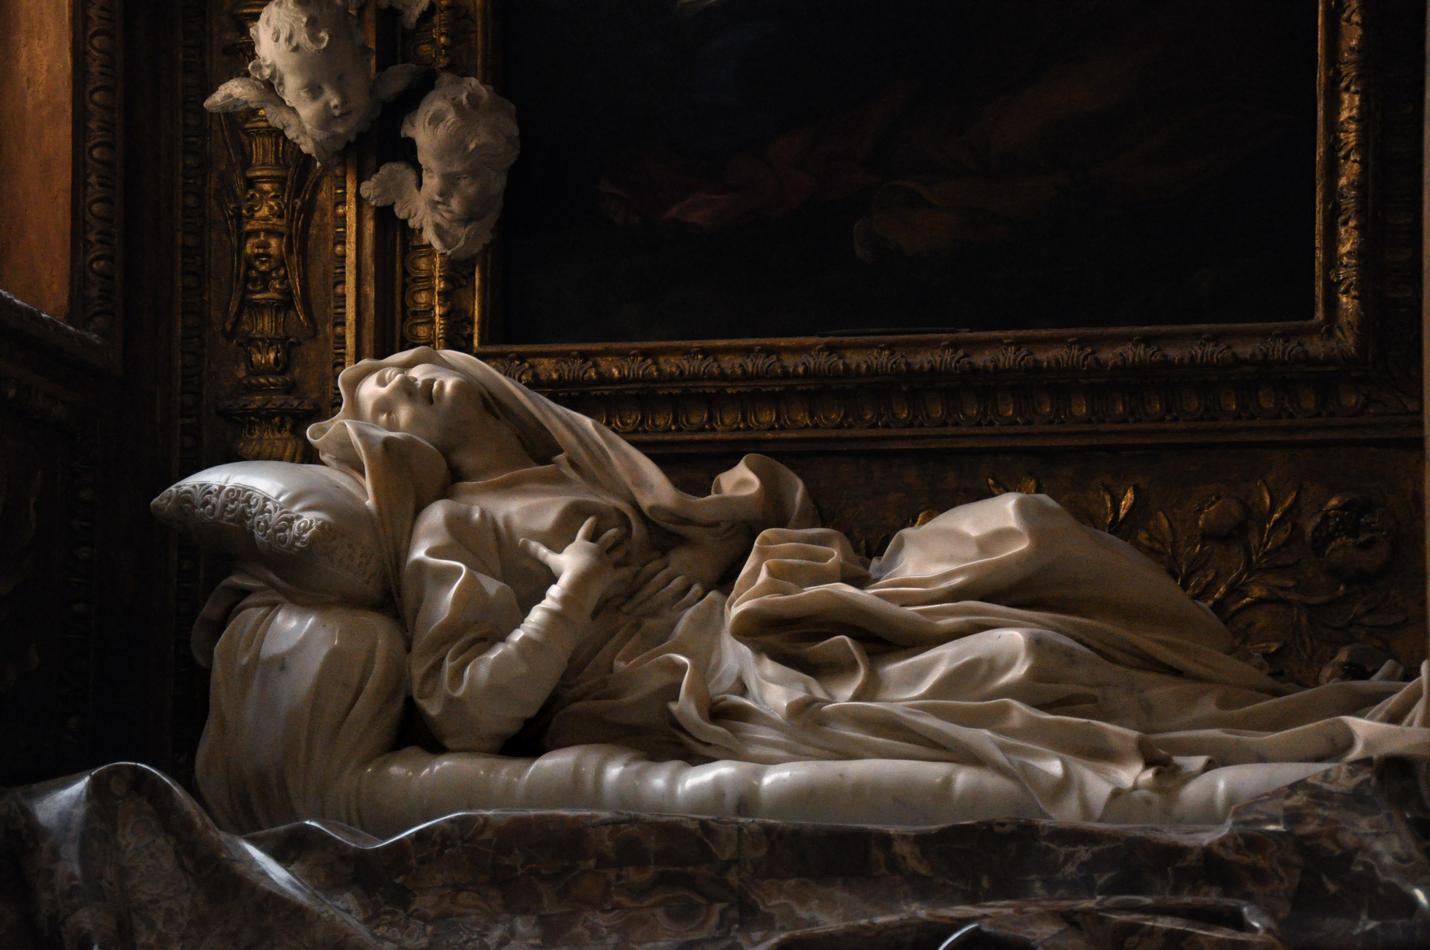 Beata_Ludovica_Albertoni_-_Bernini_-_1674_-_San_Franscesco_a_Ripa,_Rome.JPG